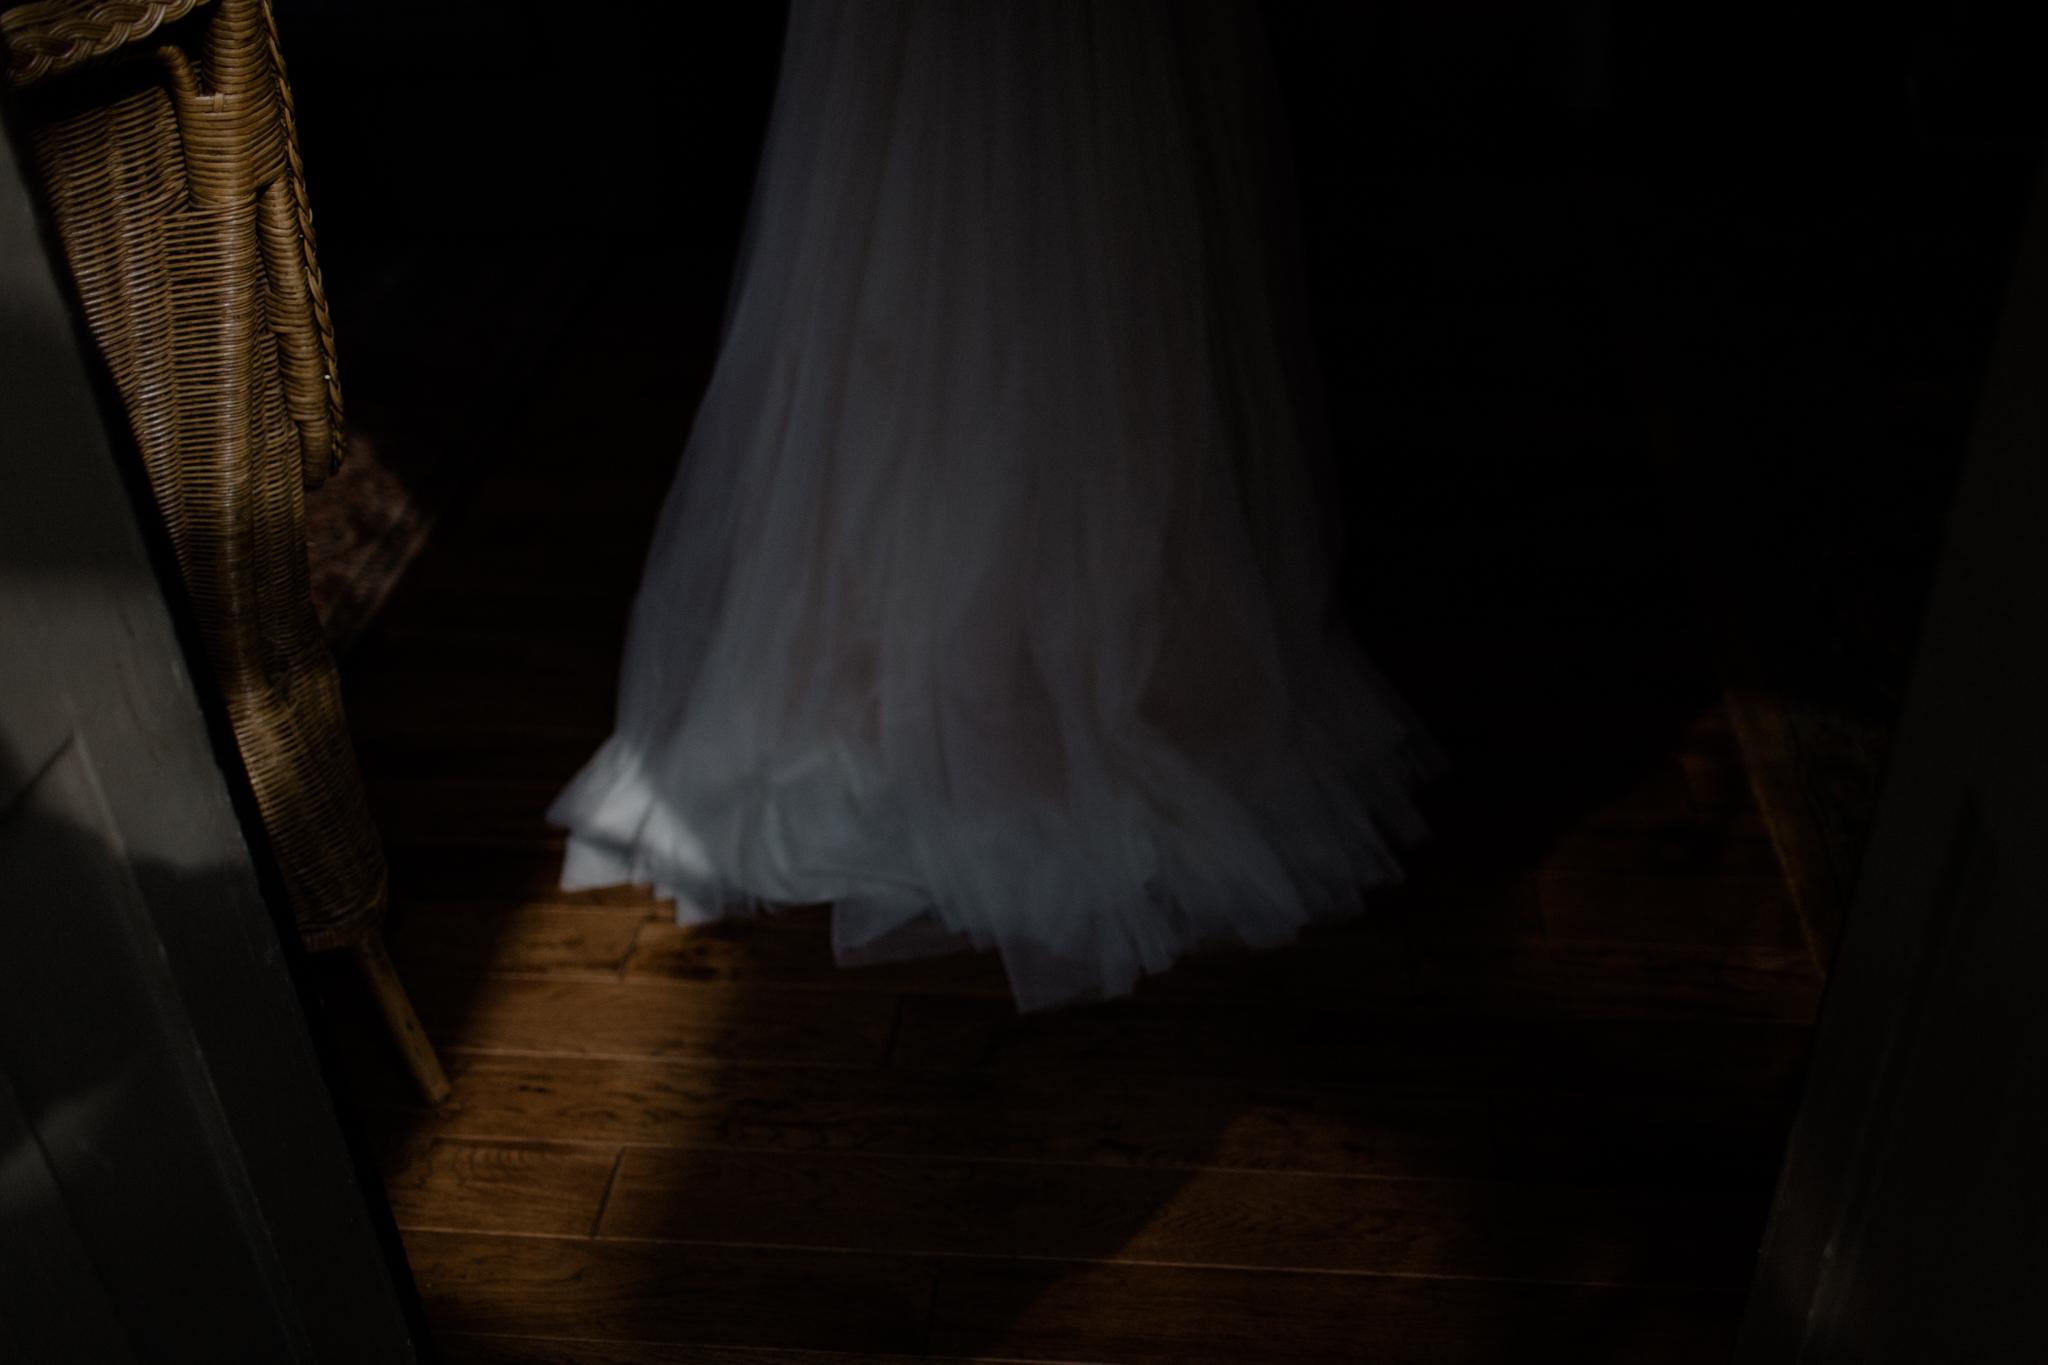 canyon run ranch wedding bohemian wedding photographer ohio bohemian wedding dayton ohio wedding photographer columbus ohio wedding photographer sarah rose cincinnati wedding photographer